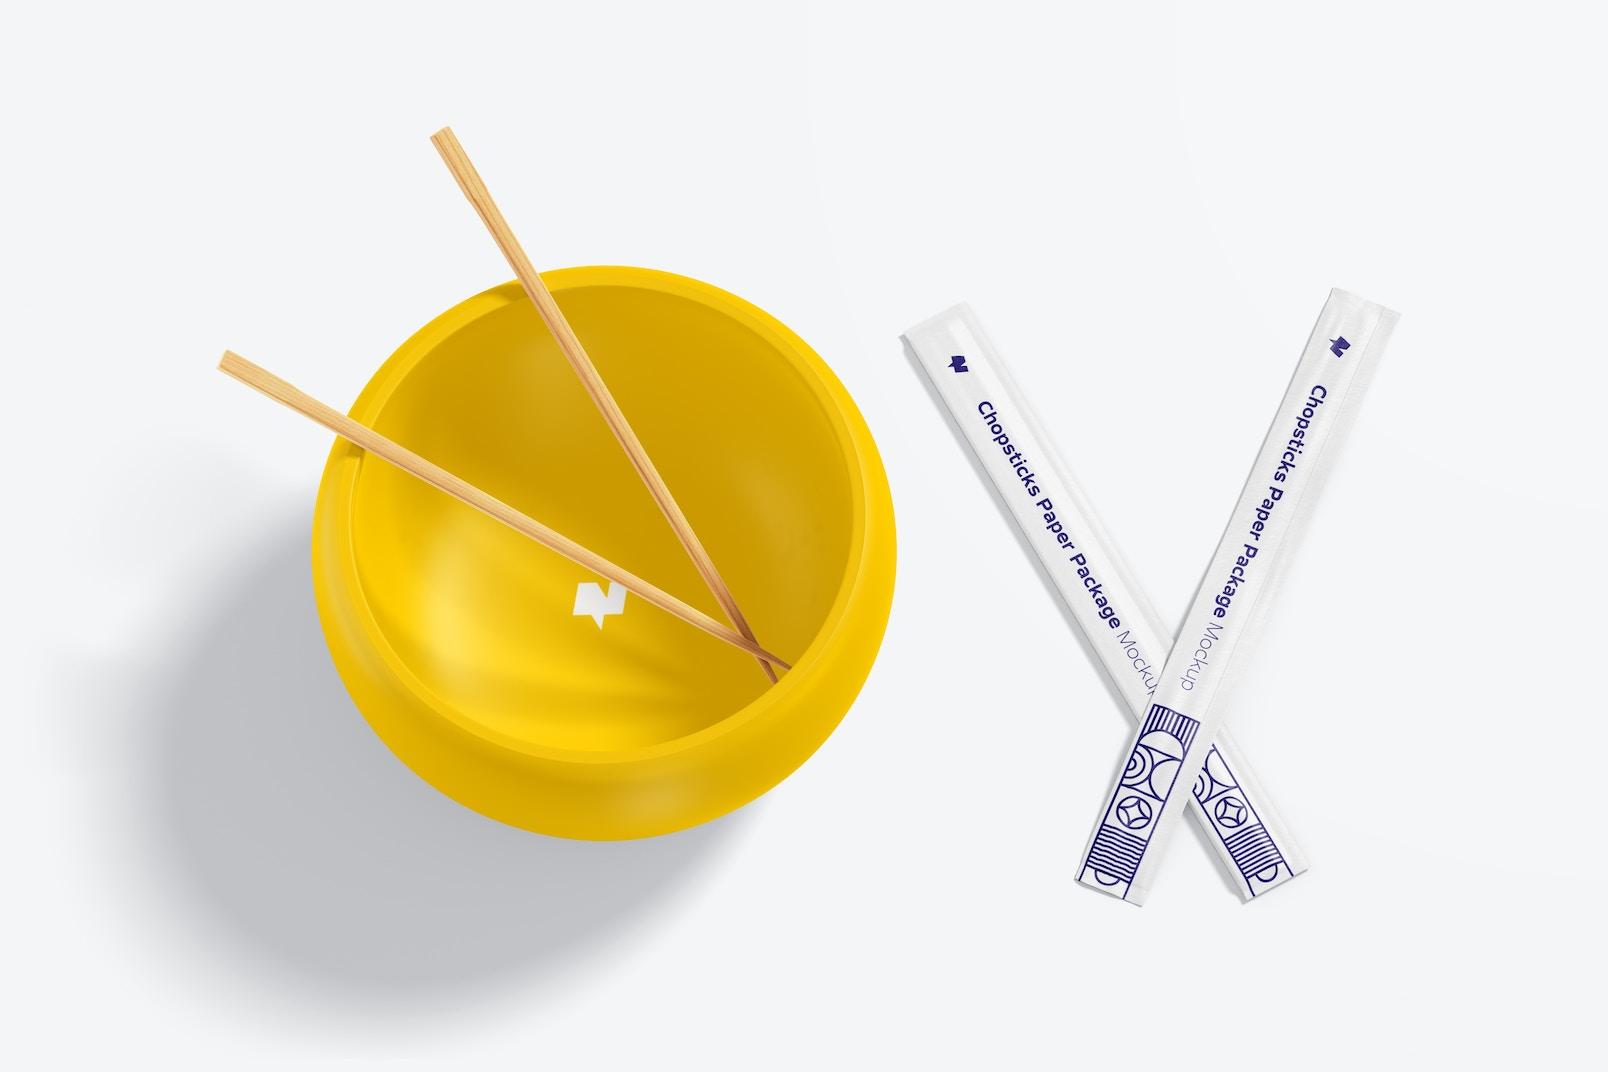 Maqueta de Palillos Chinos en Empaques de Papel con Tazón